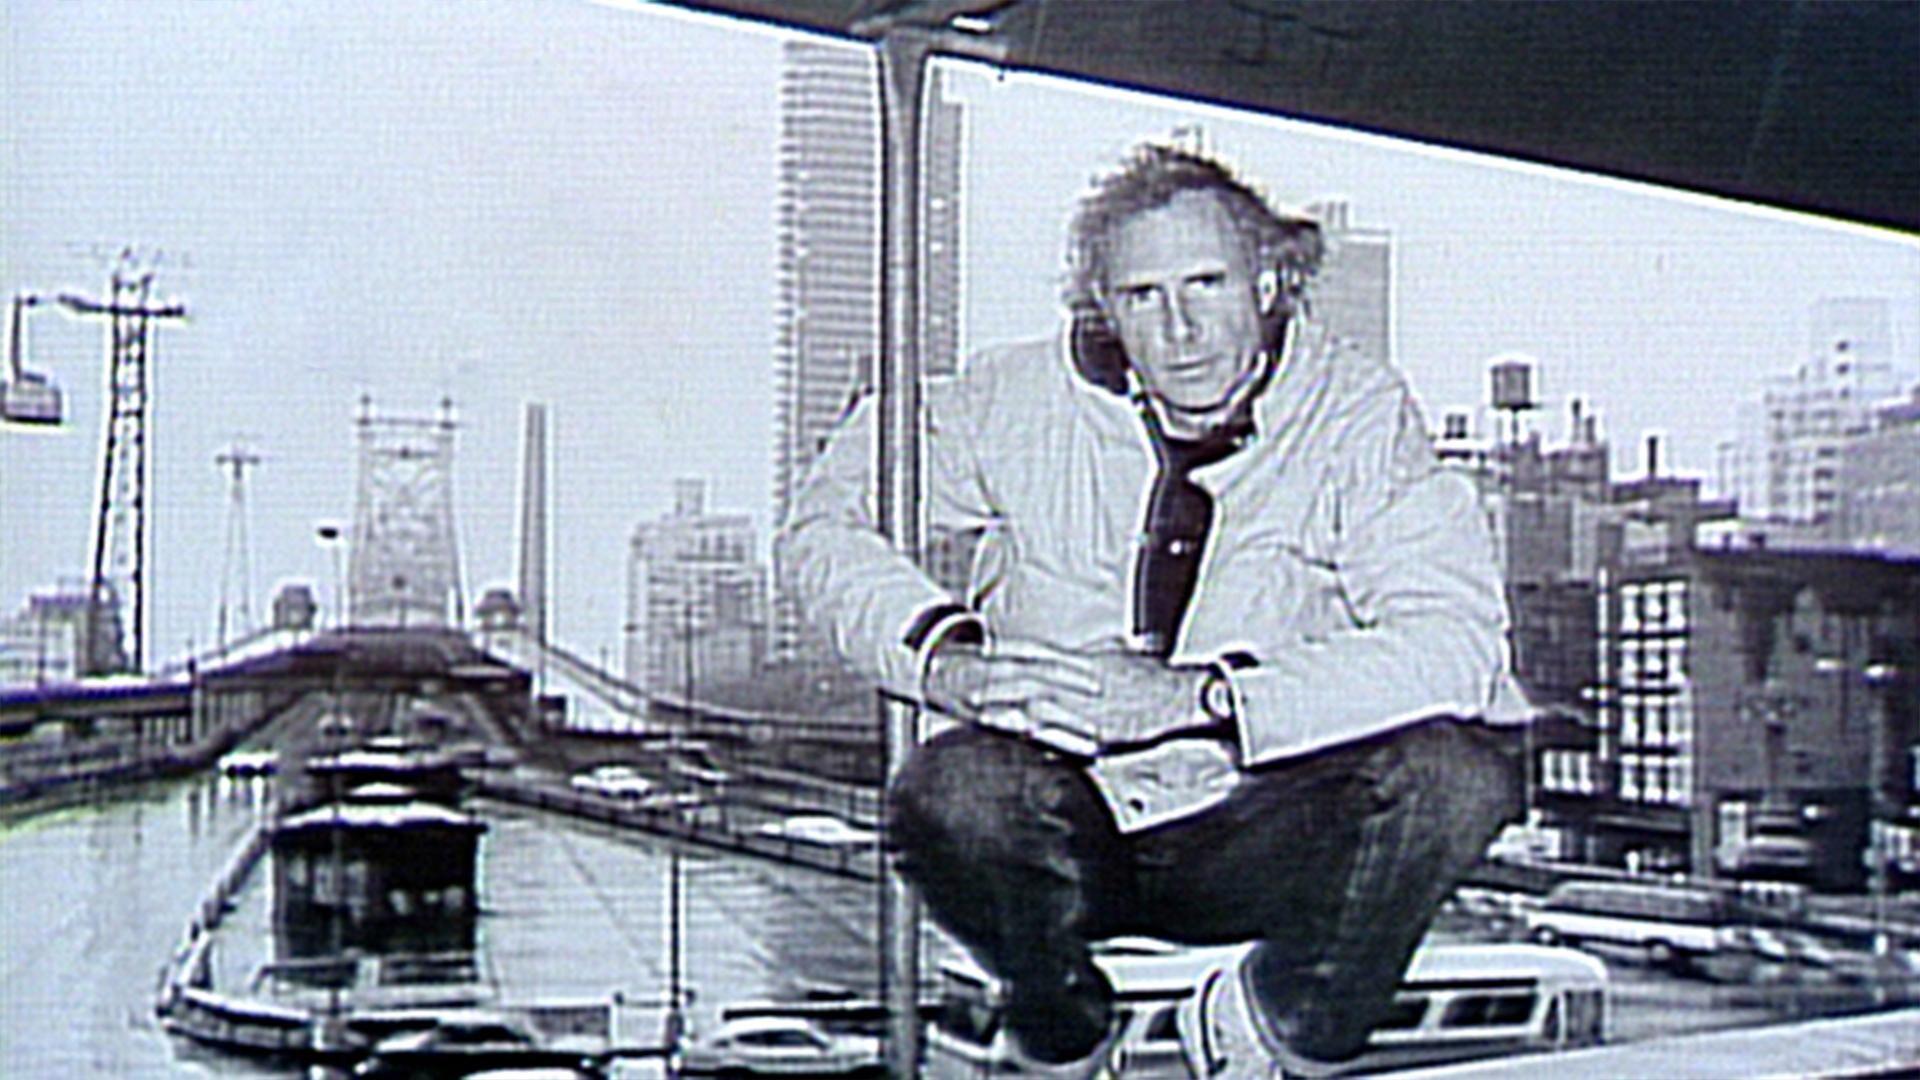 Billy Crystal: March 17, 1984